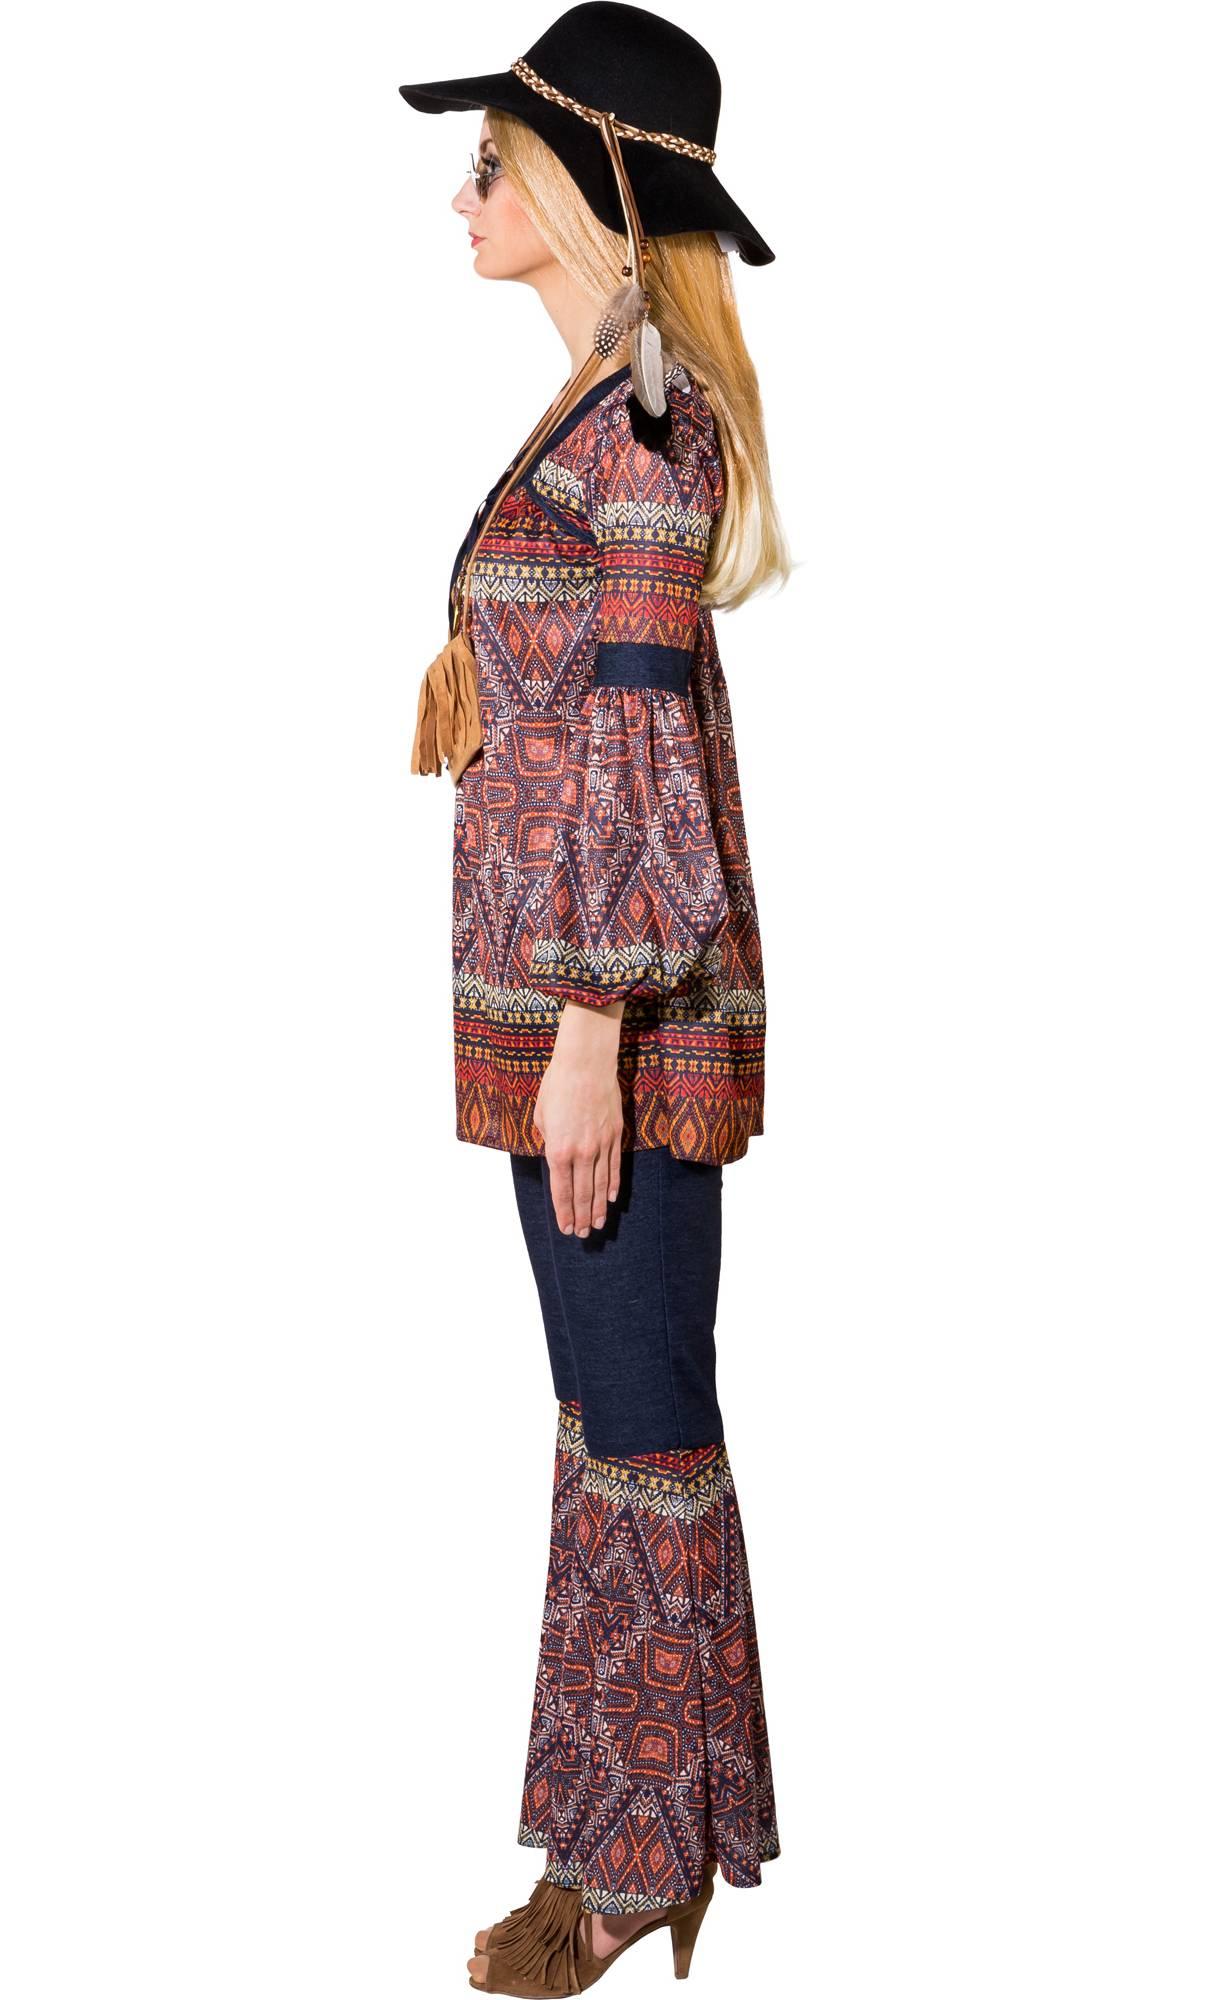 Costume-Hippie-femme-grande-taille-2